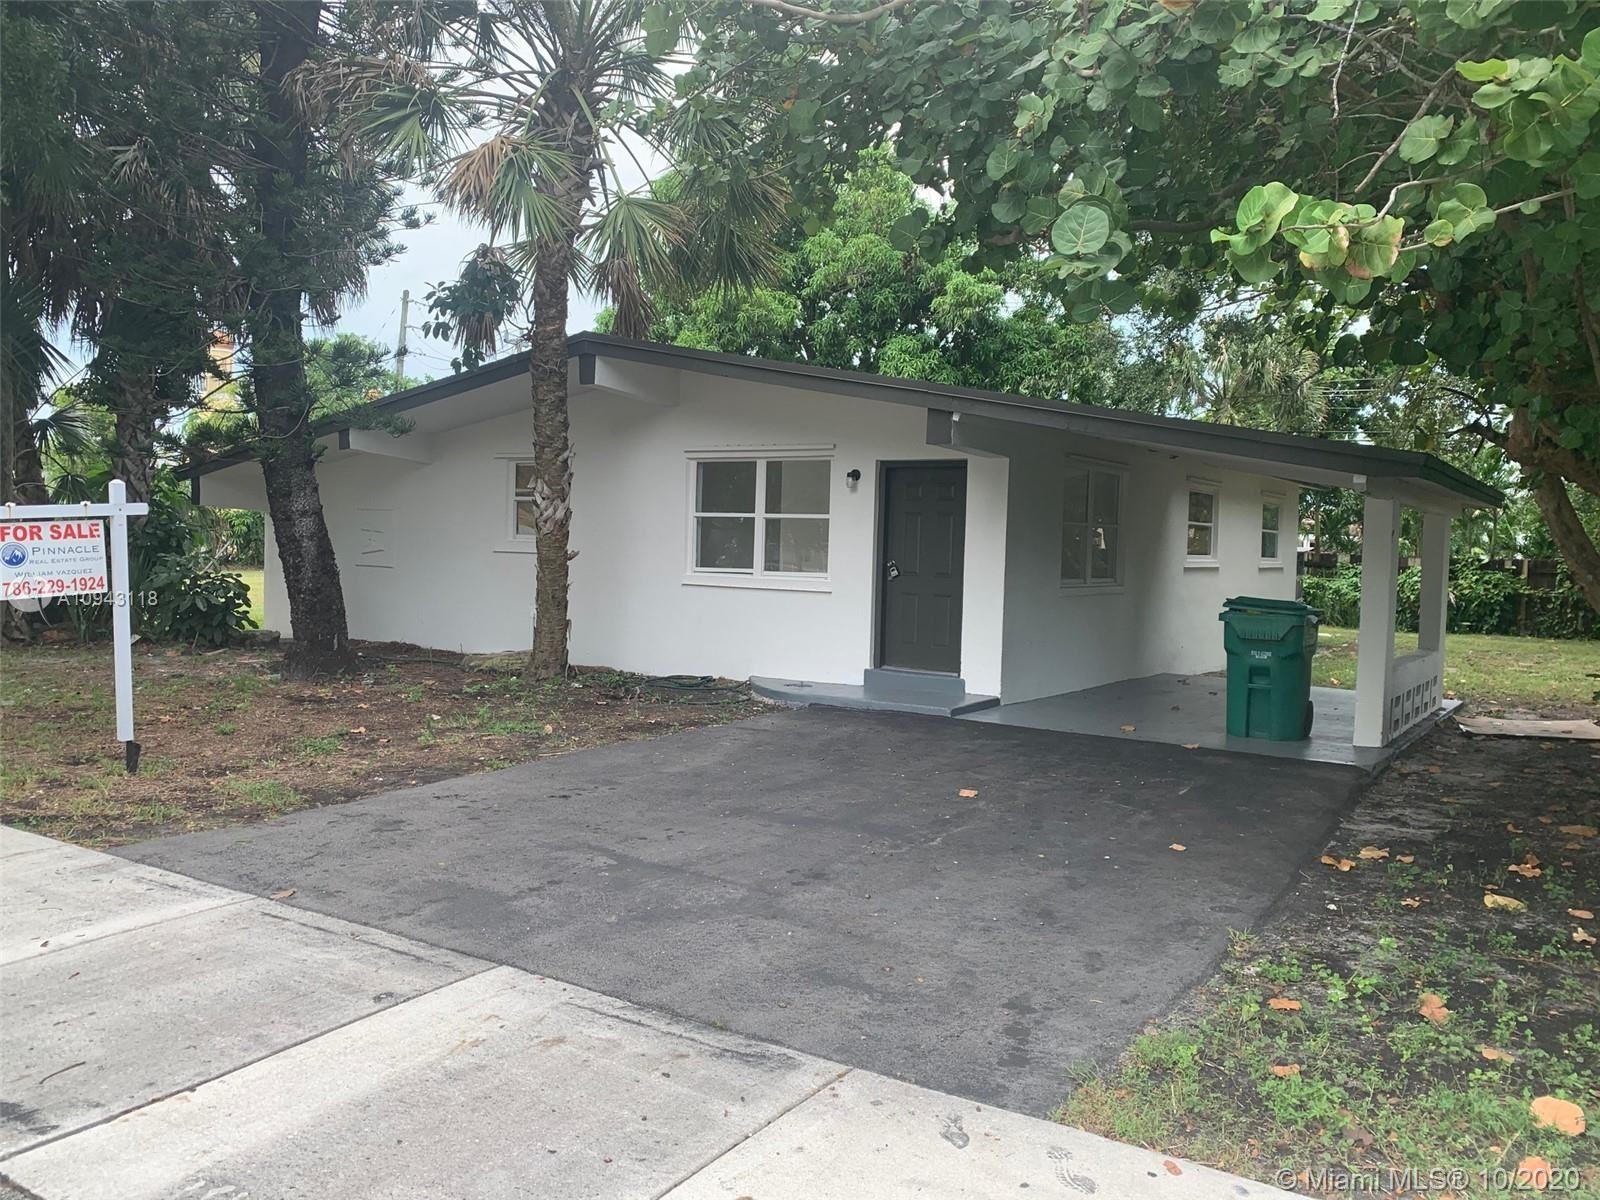 4265 NW 183rd St, Miami Gardens, FL 33055 - #: A10943118